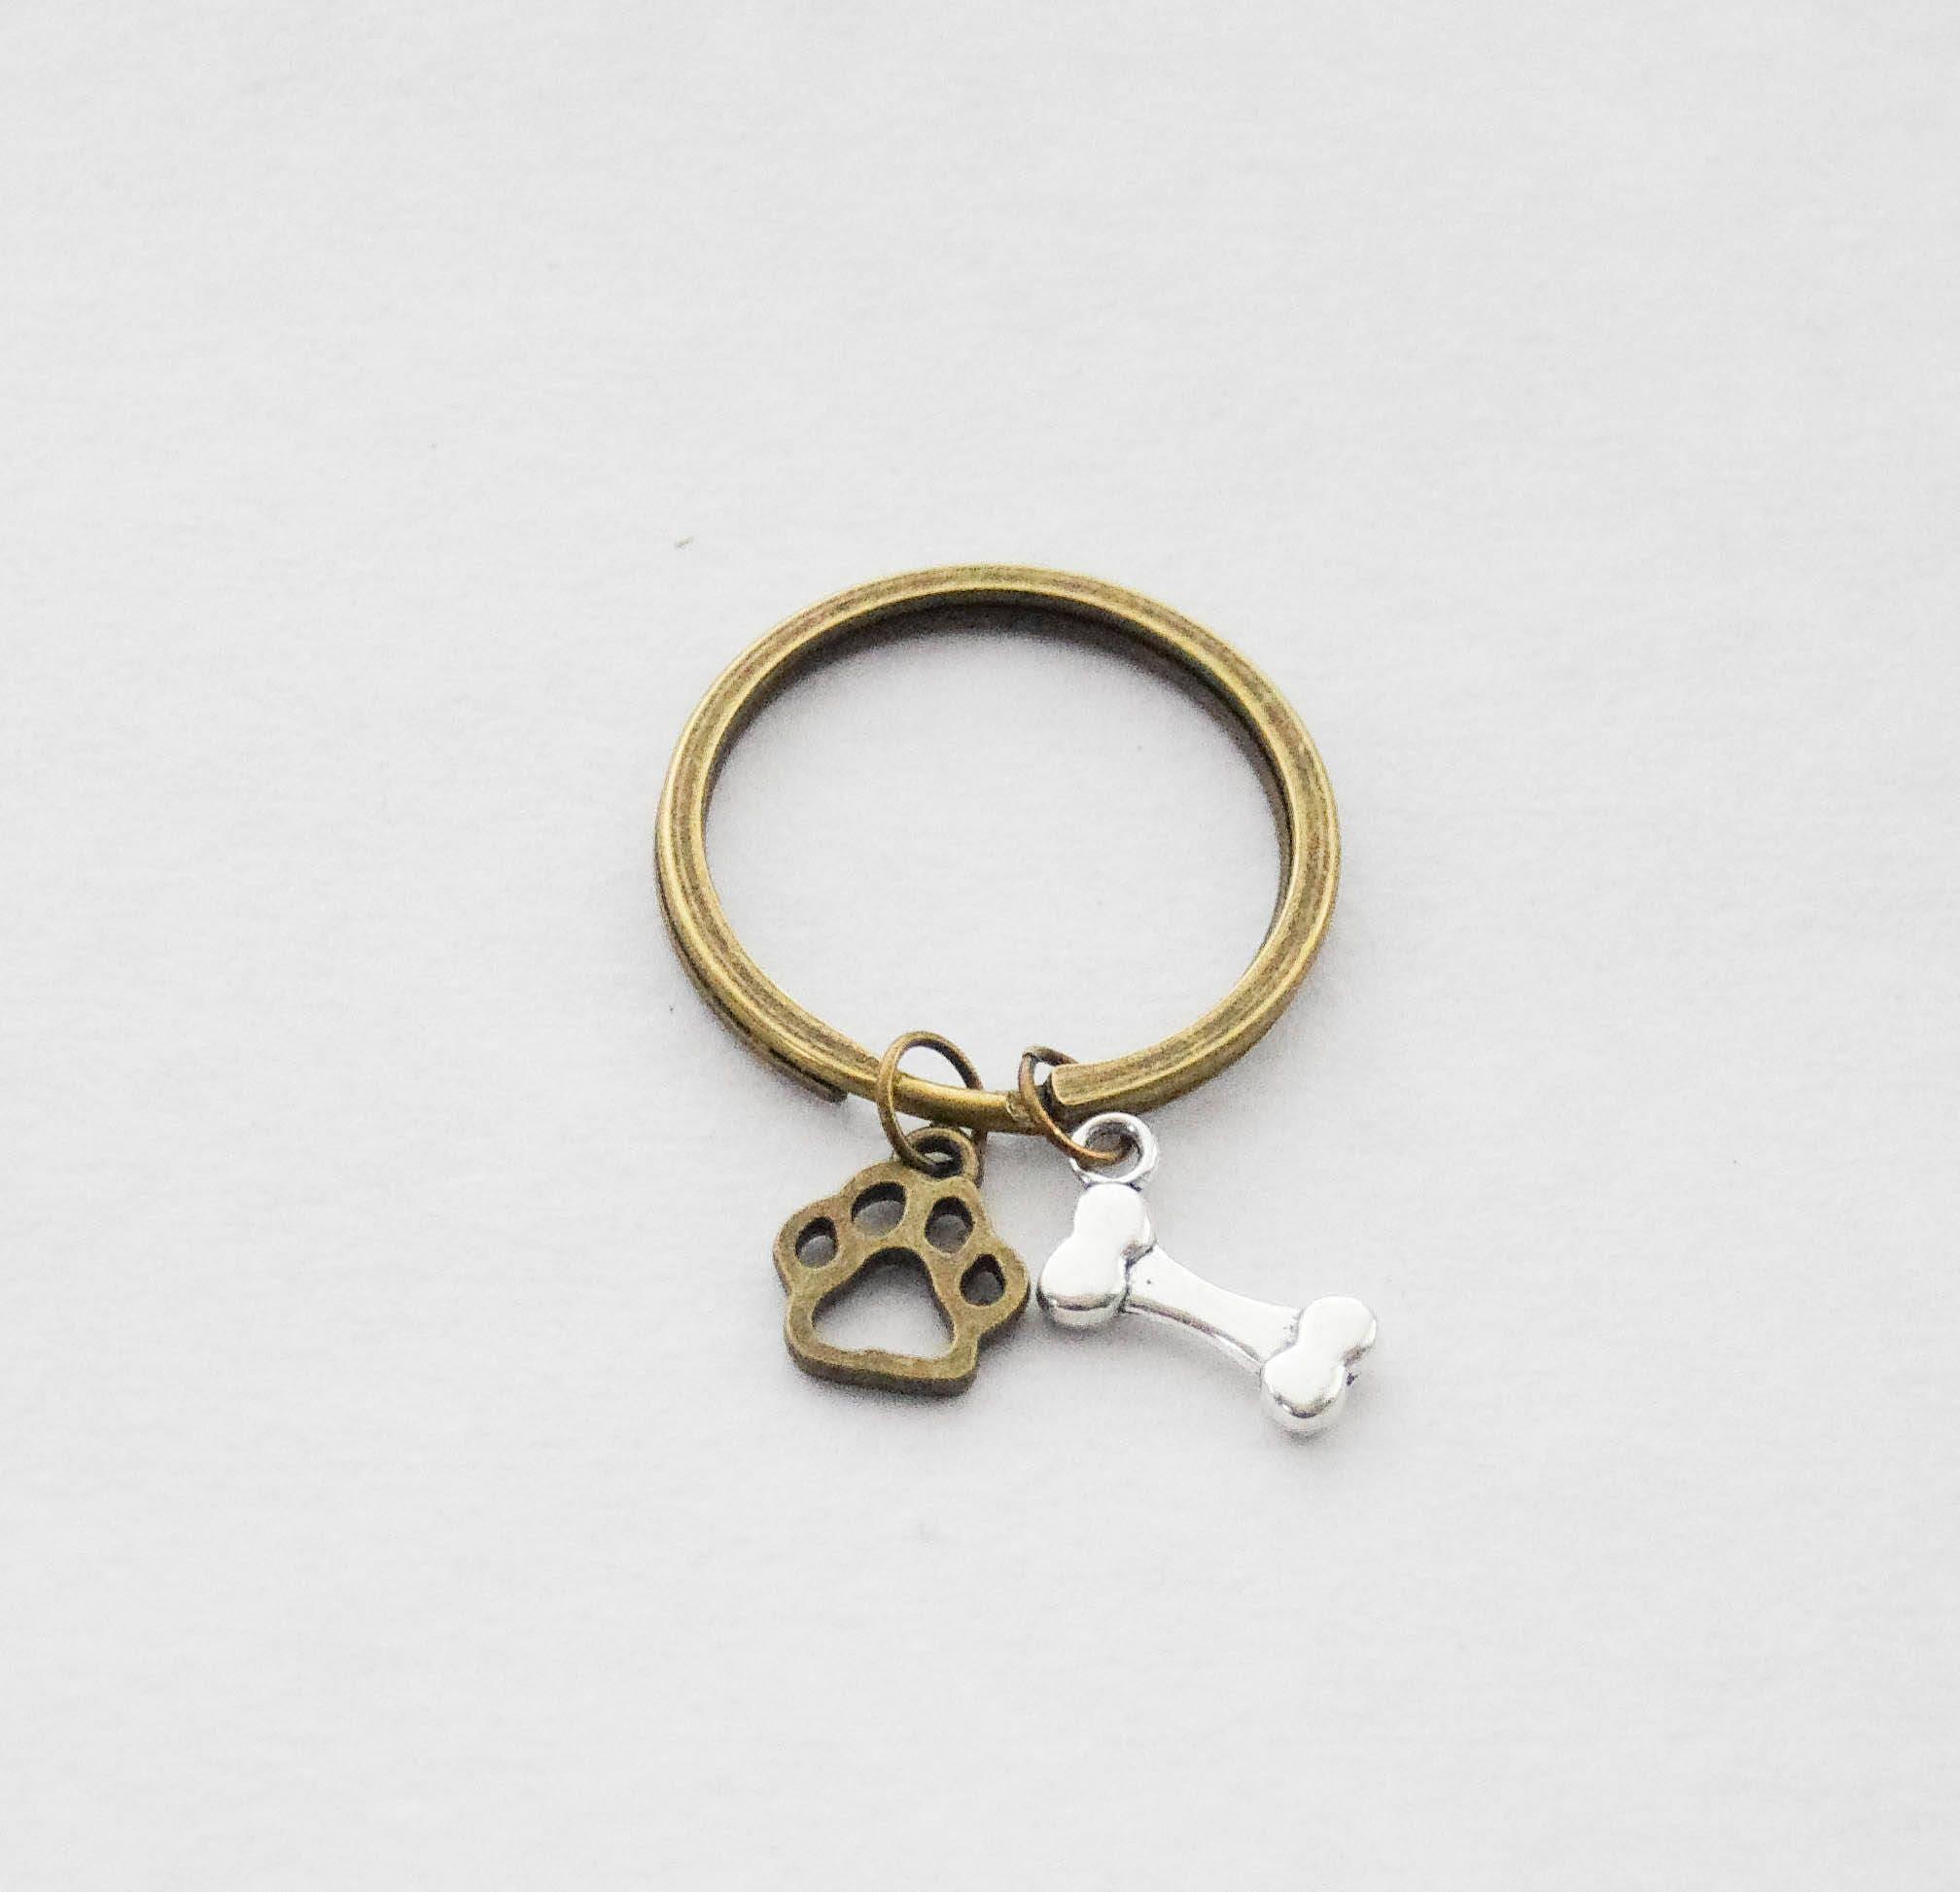 Keychains Lightupcircuitboardkeychain Paw Print Keychain Dog Lover Bone Pawprint Pet